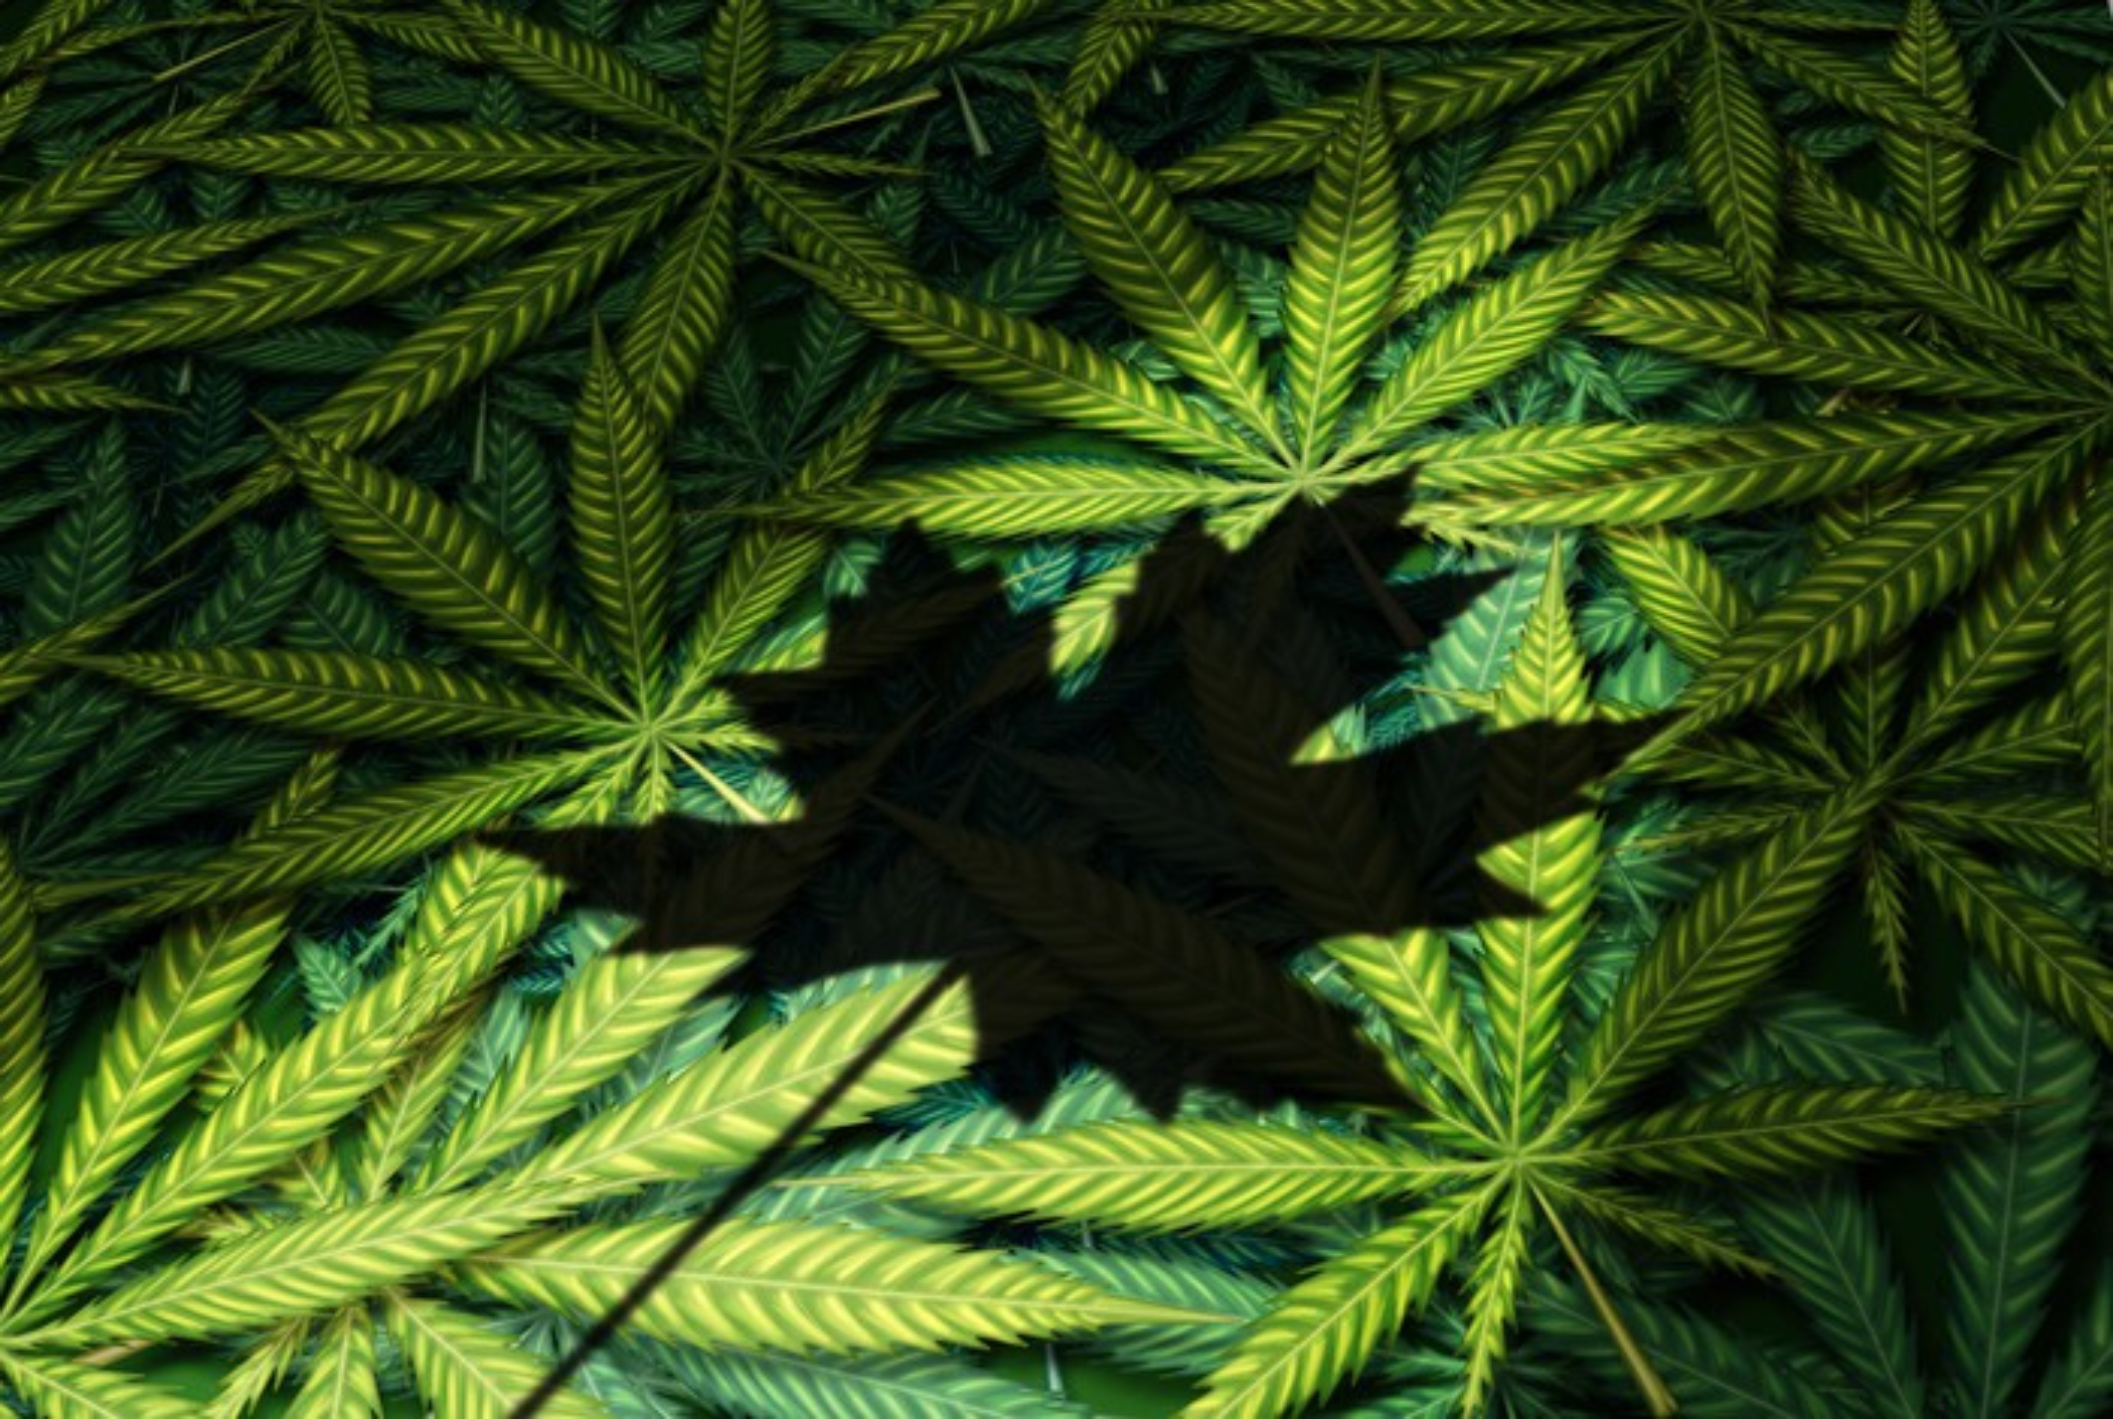 Canadian maple leaf shadow on top of pile of marijuana leaves